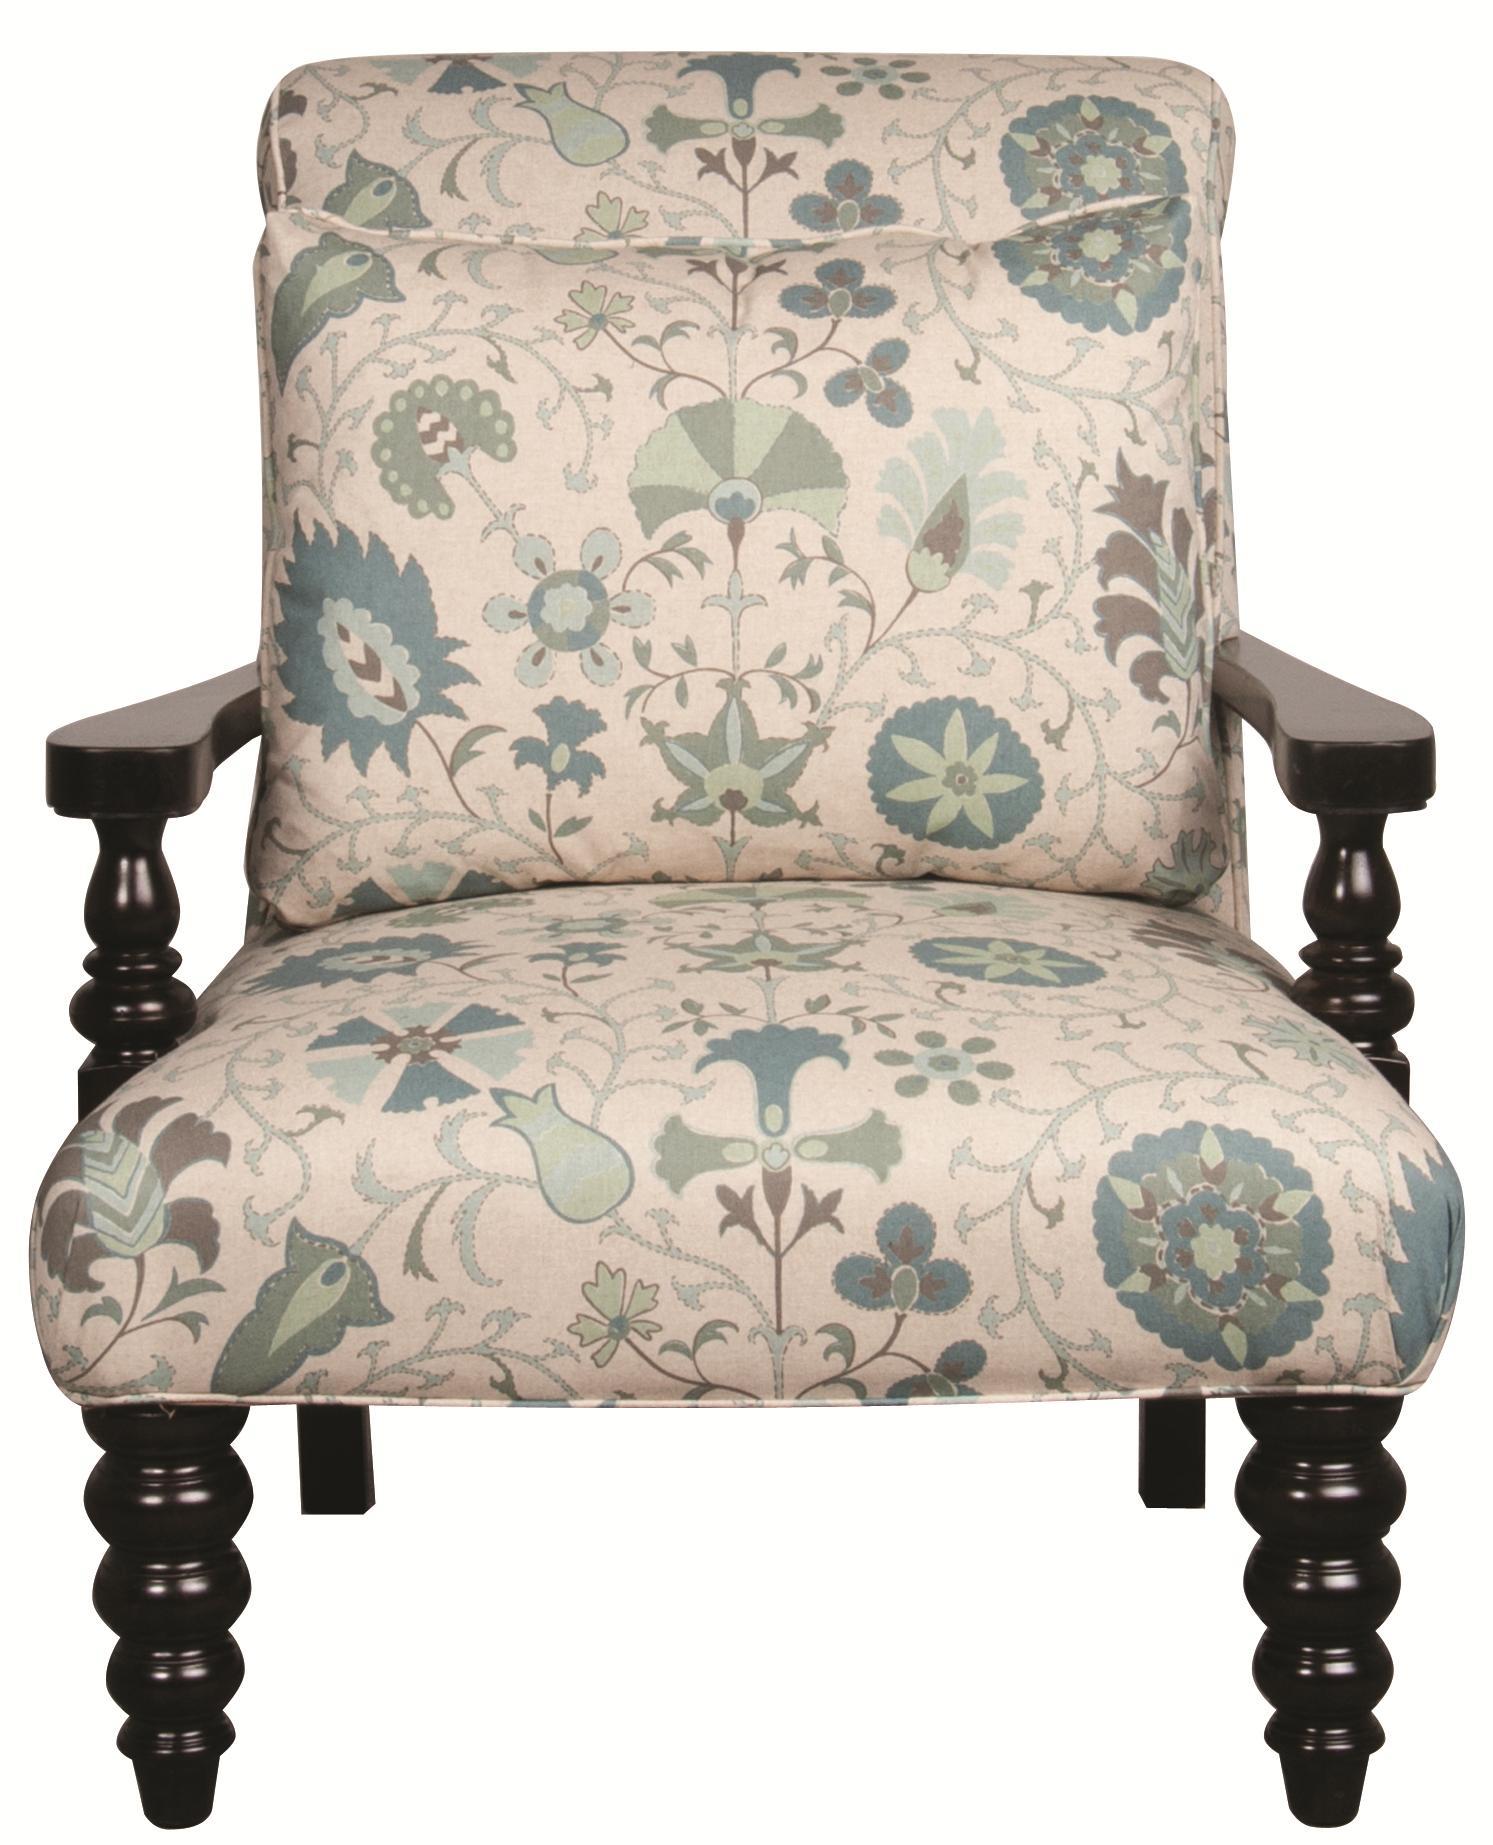 Morris Home Furnishings Carina Carina Trim Chair - Item Number: 111295312